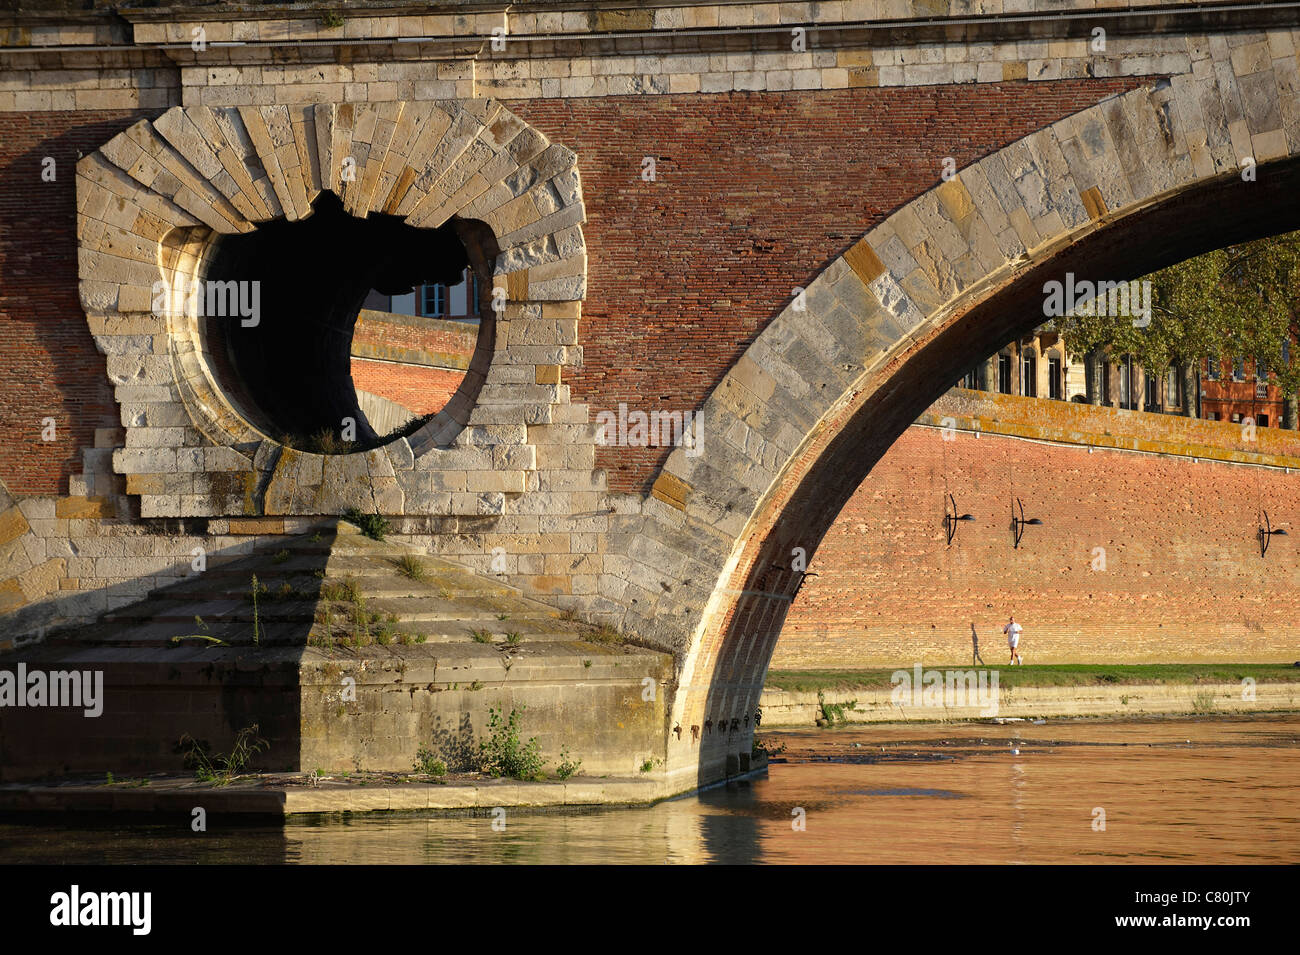 France, Haute-Garonne, Toulouse, Garonne River, Pont Neuf Bridge - Stock Image